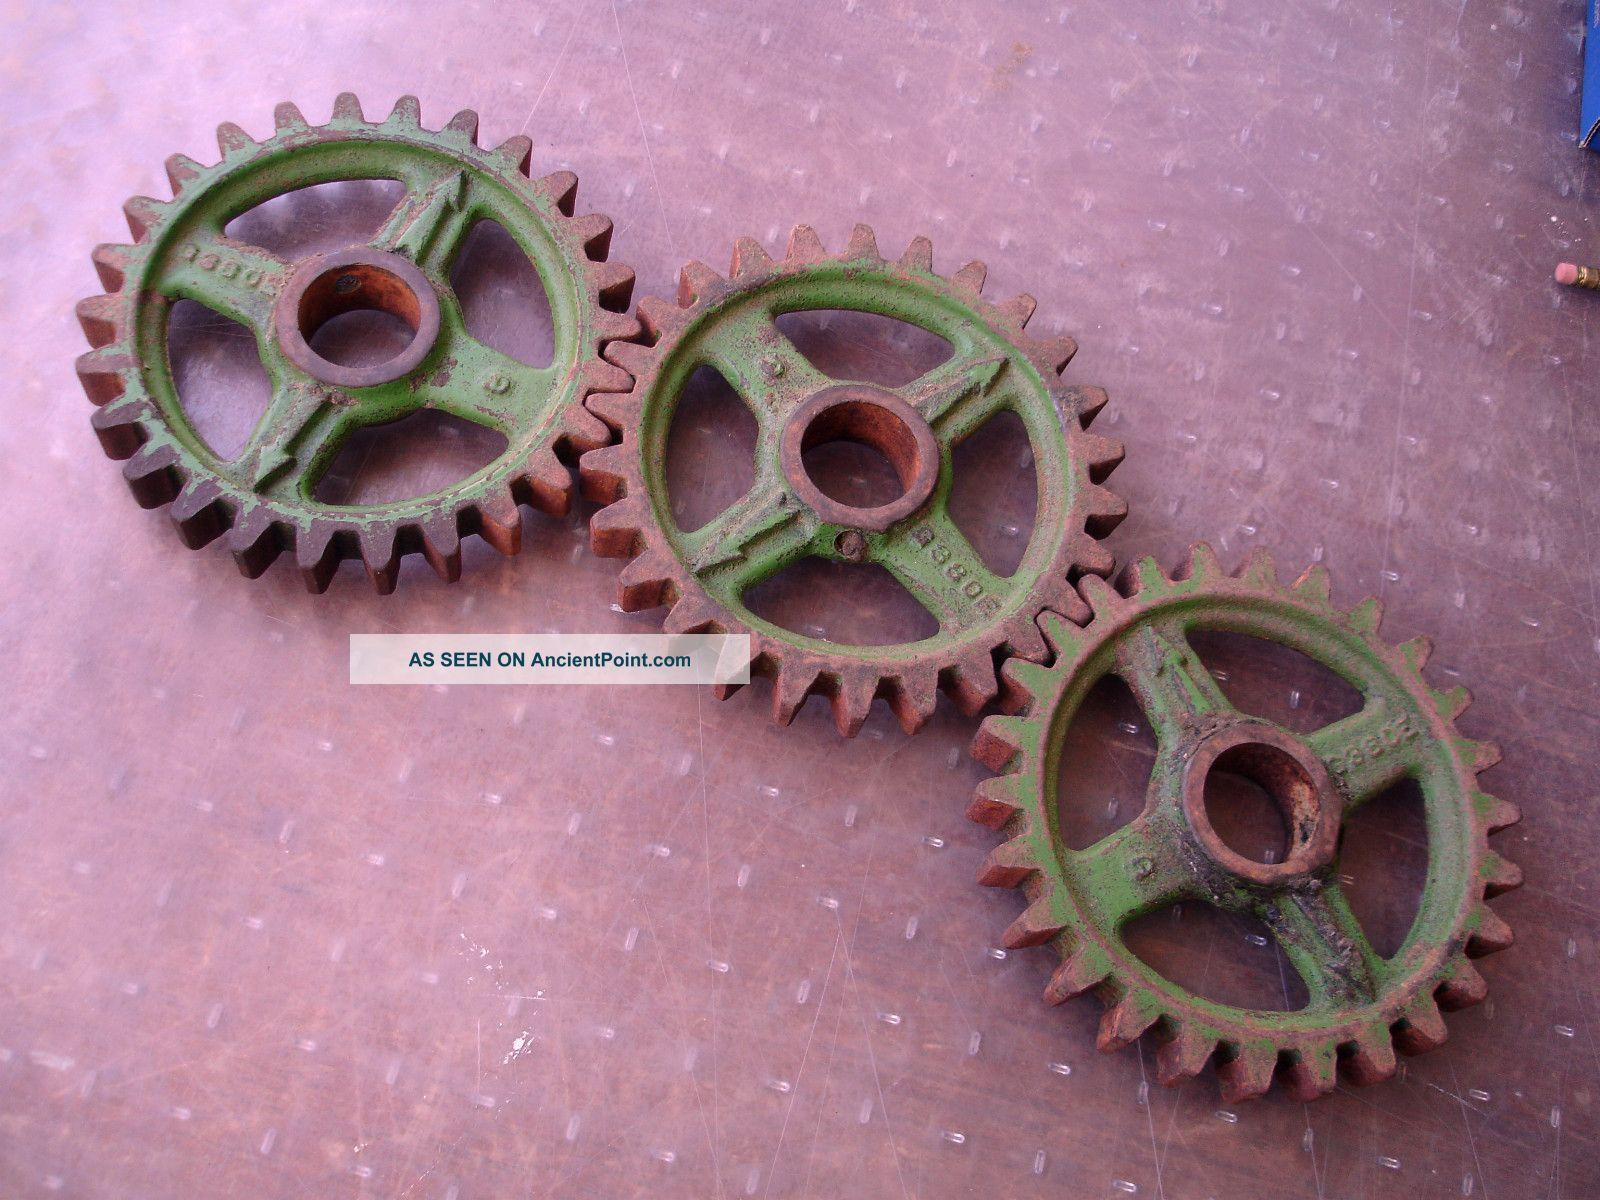 Vintage Industrial Cast Iron Gears - Cog